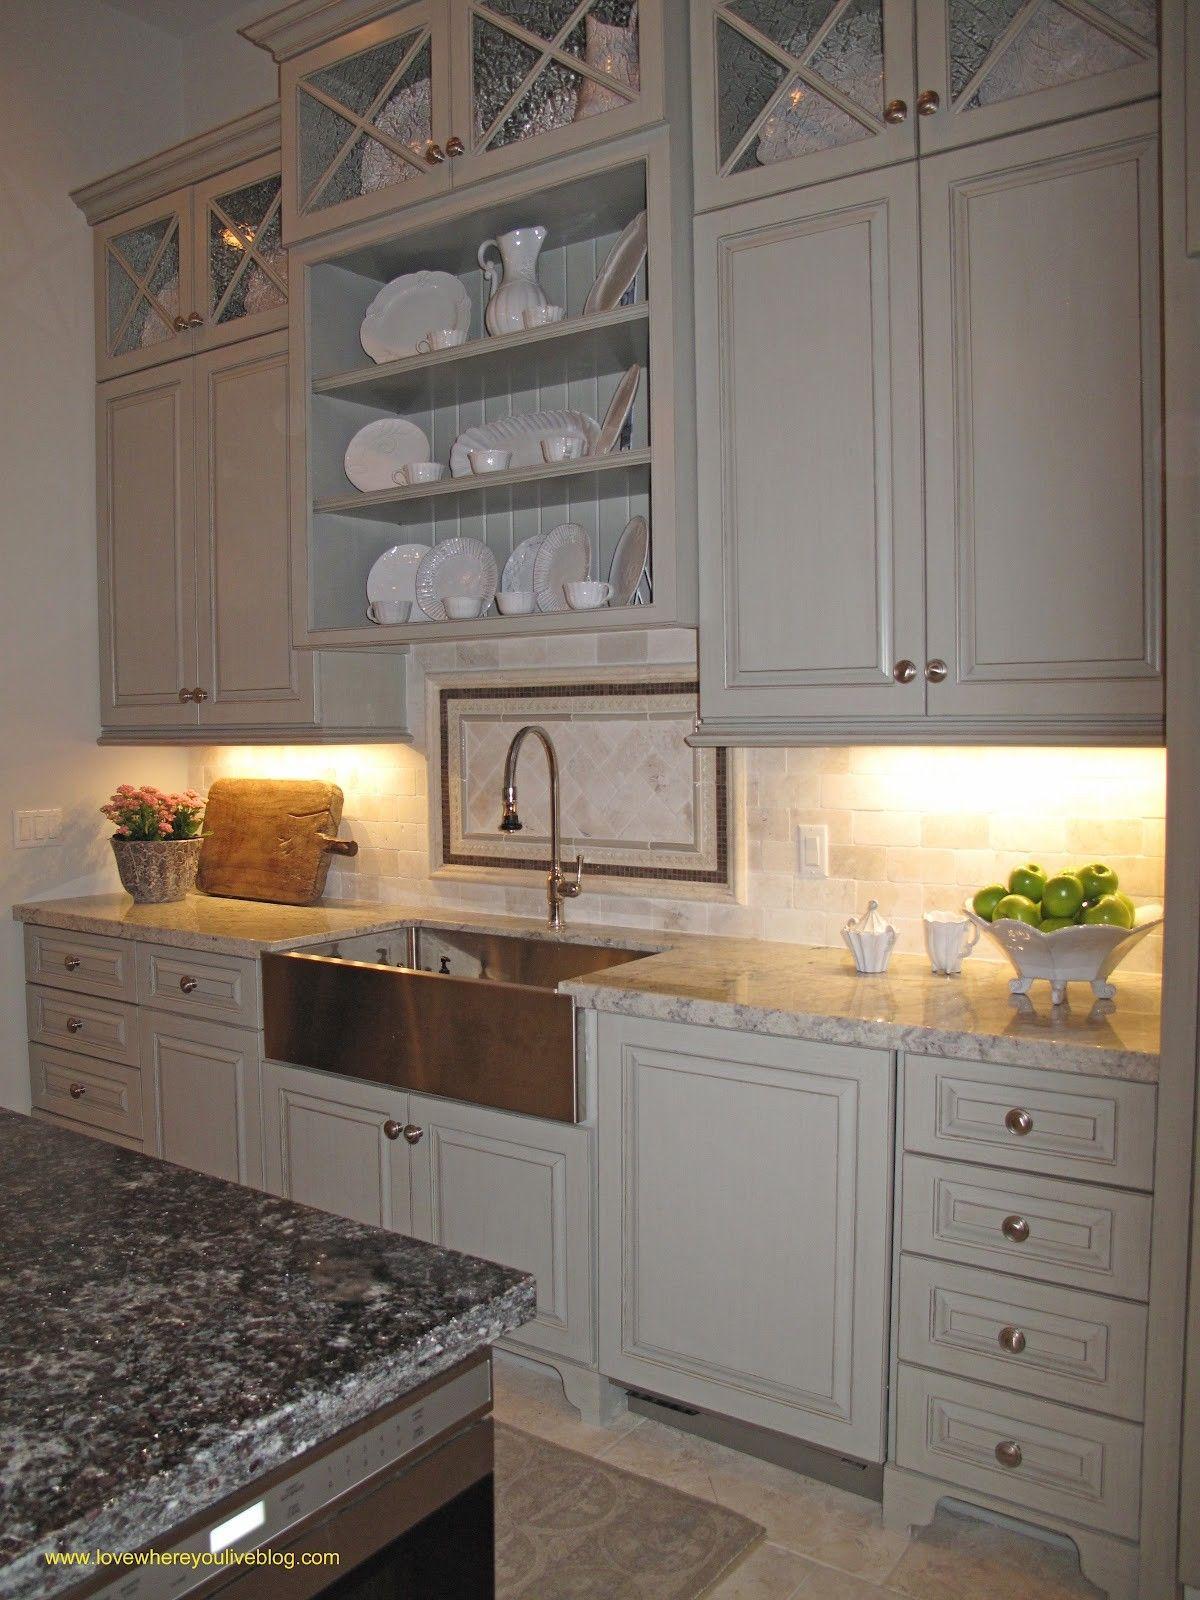 Adding Shelves Above Kitchen Cabinets | A Baker's kitchen ...